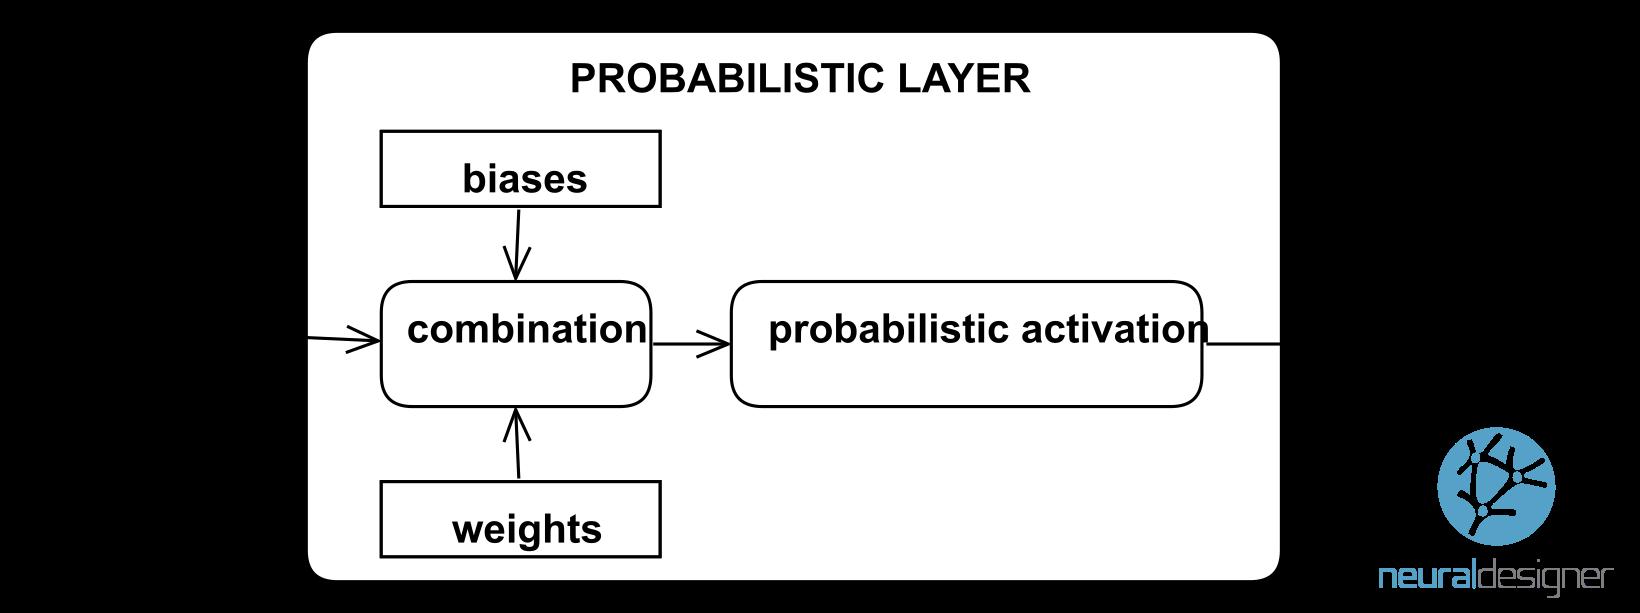 probabilistic layer